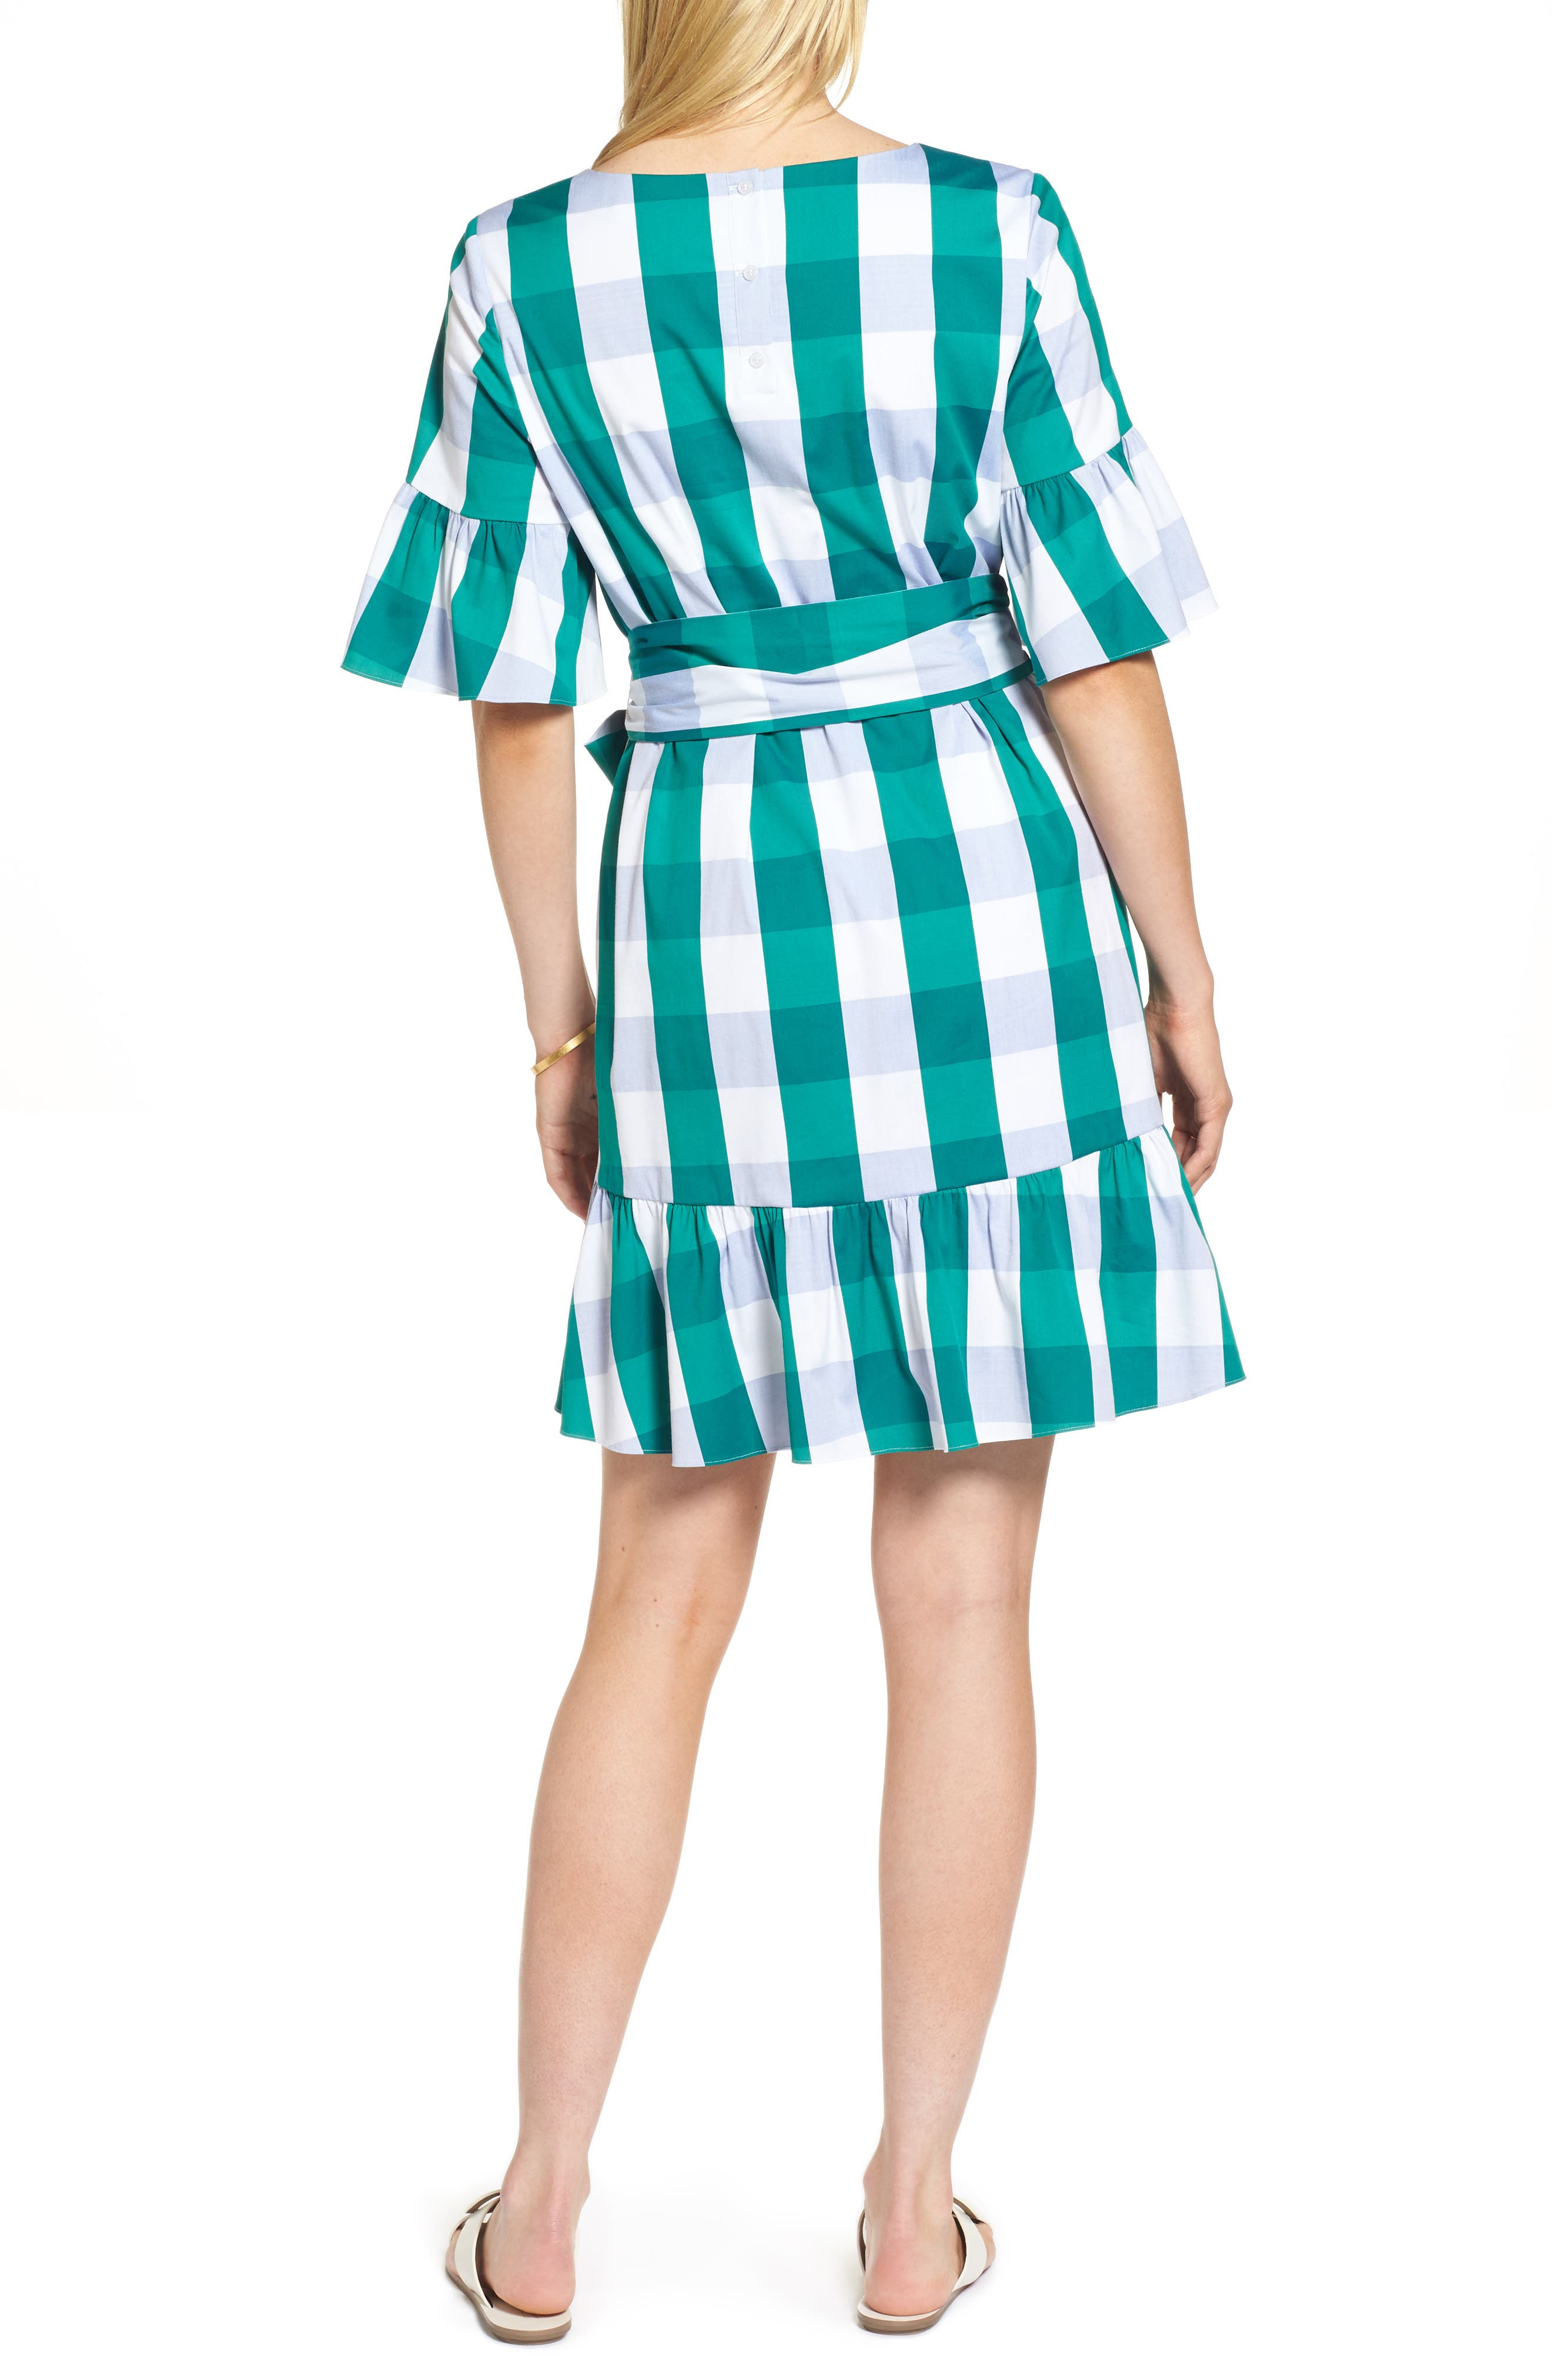 Ruffle & Bow Dress,                             Alternate thumbnail 3, color,                             Green- Blue Gingham